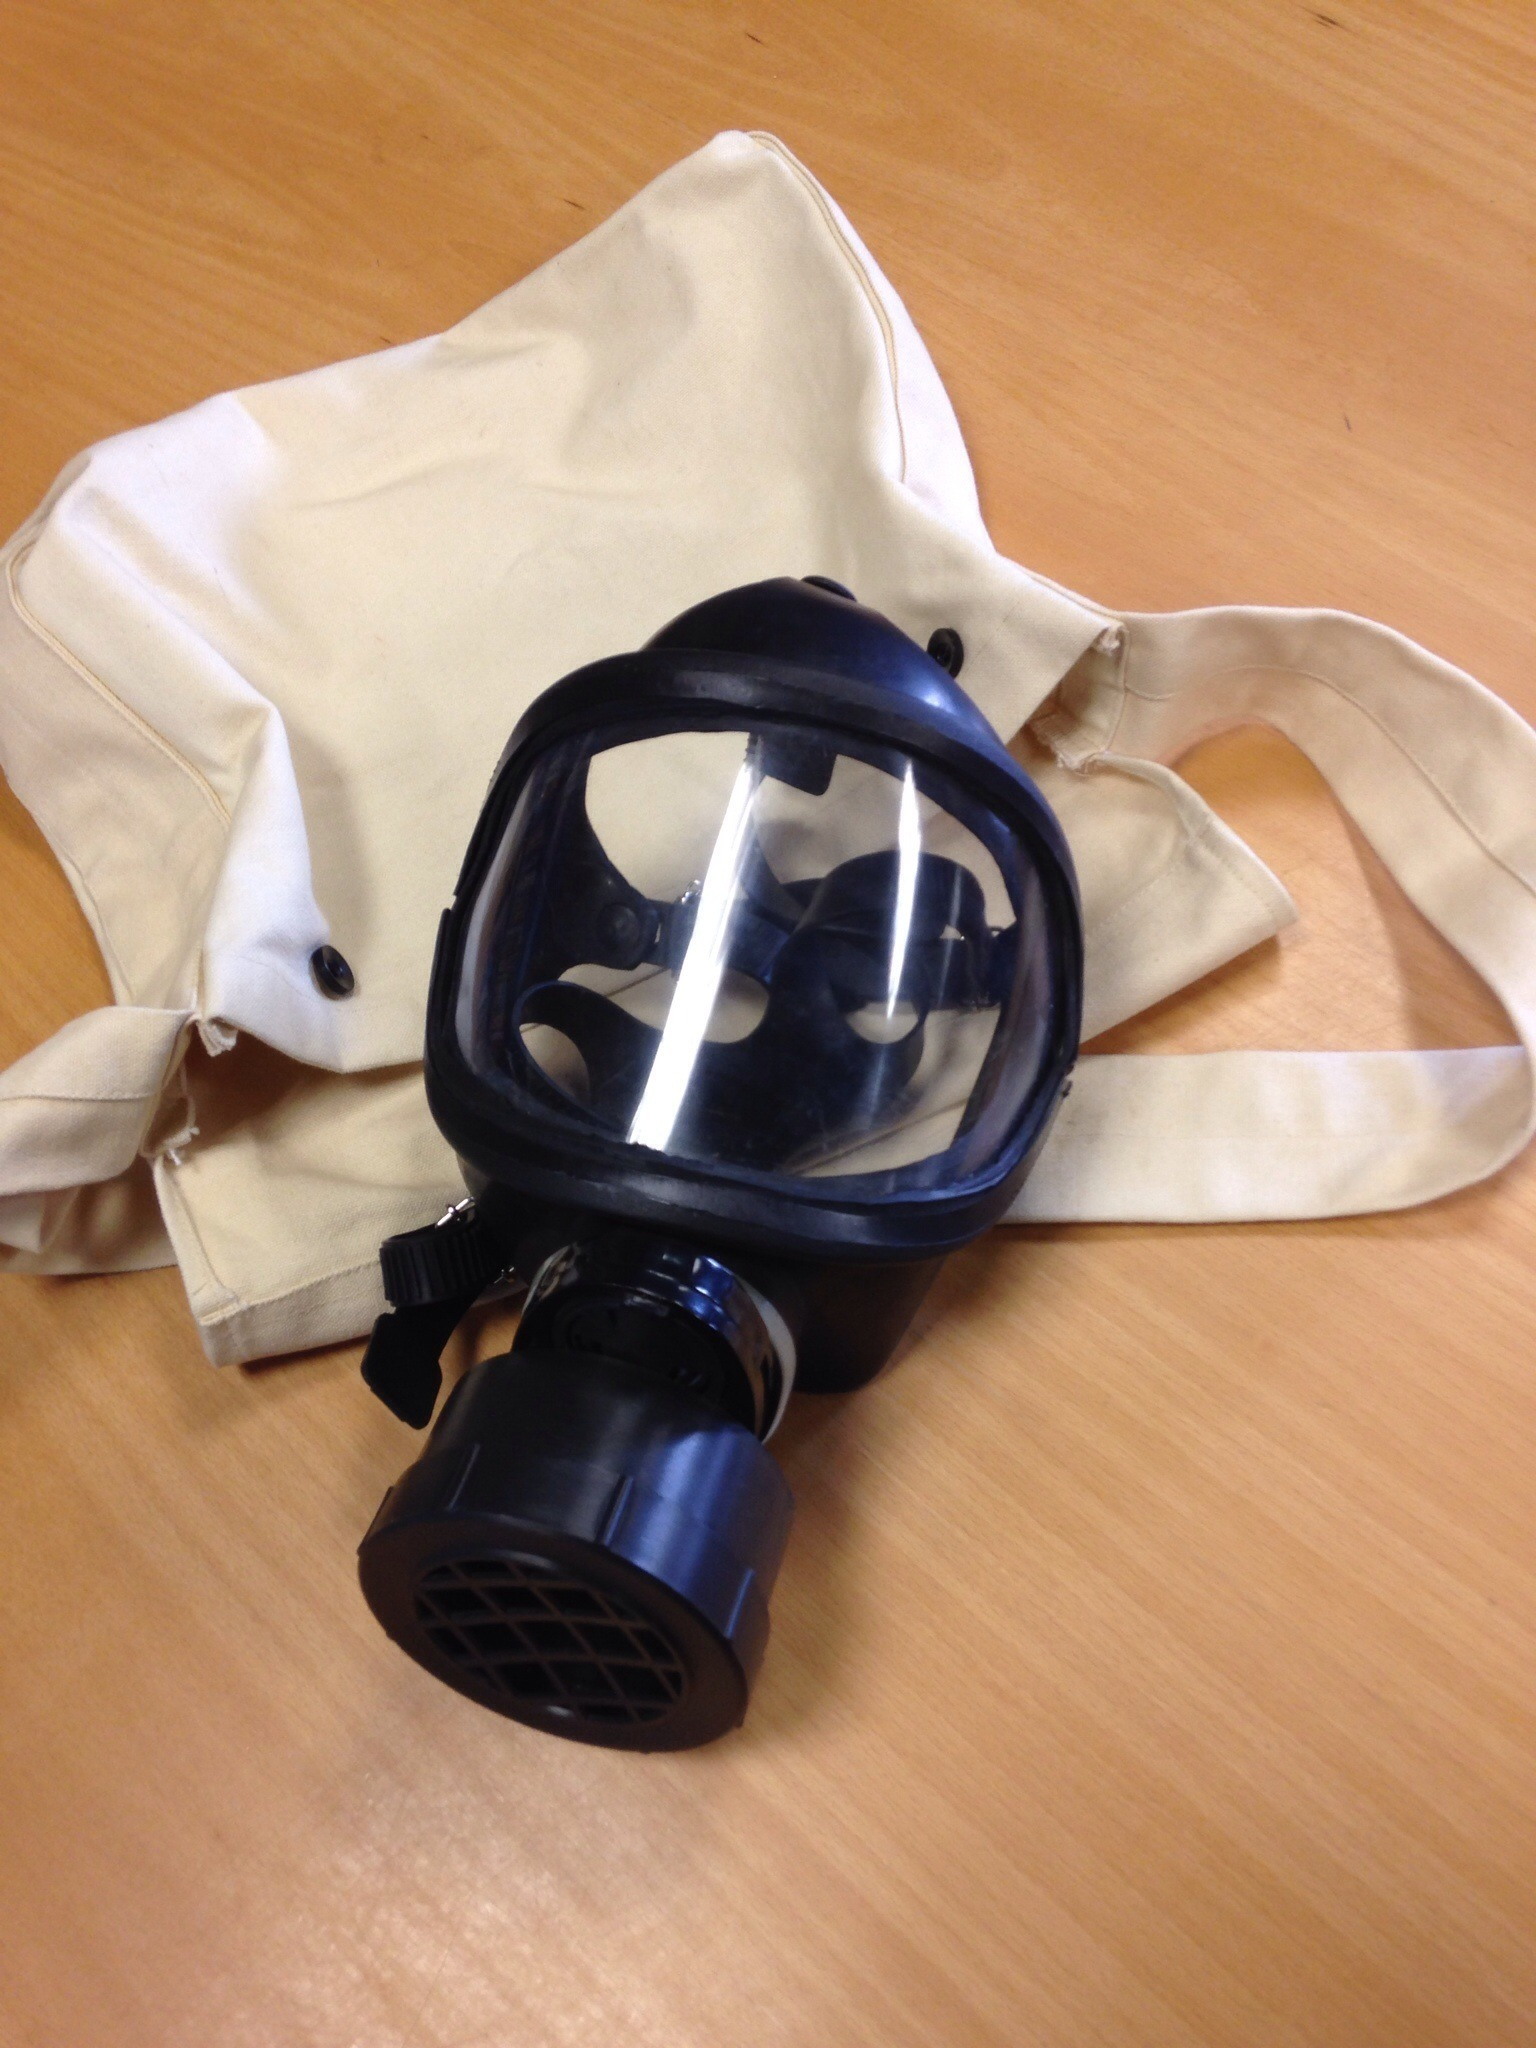 Gas mask from World War II